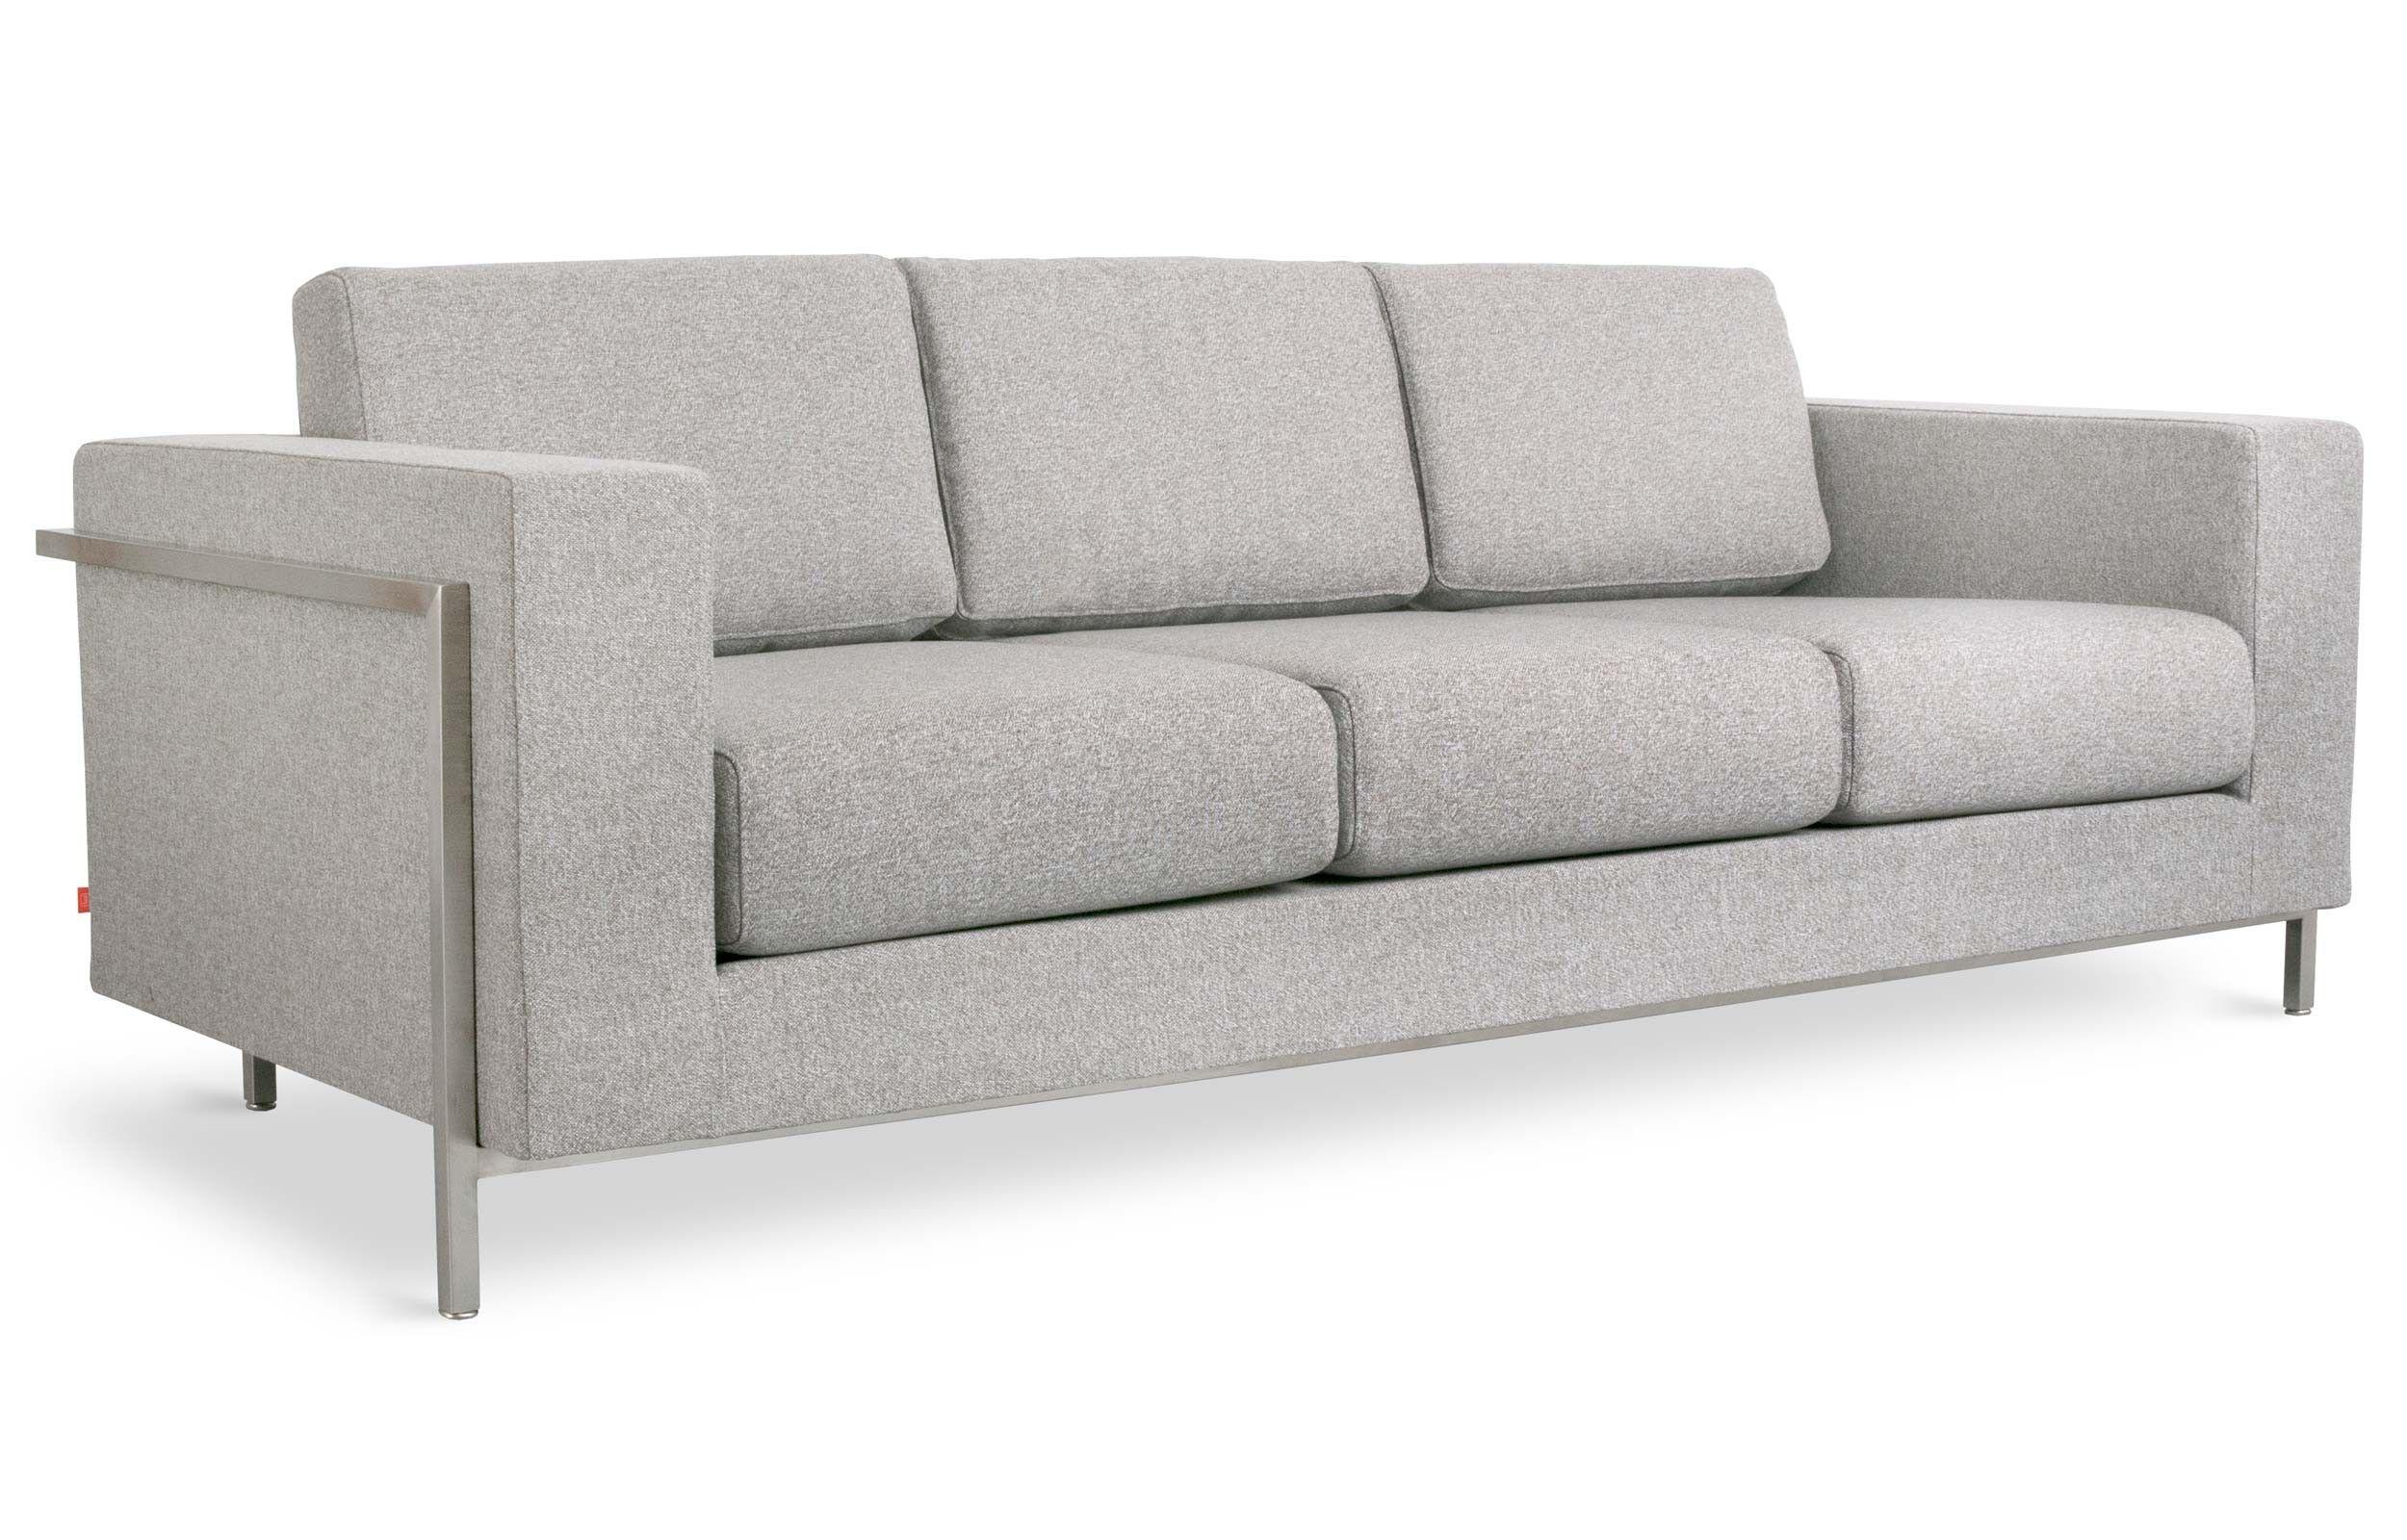 Davenport Sofa Couch Did Your Grandma Own A Davenport Home